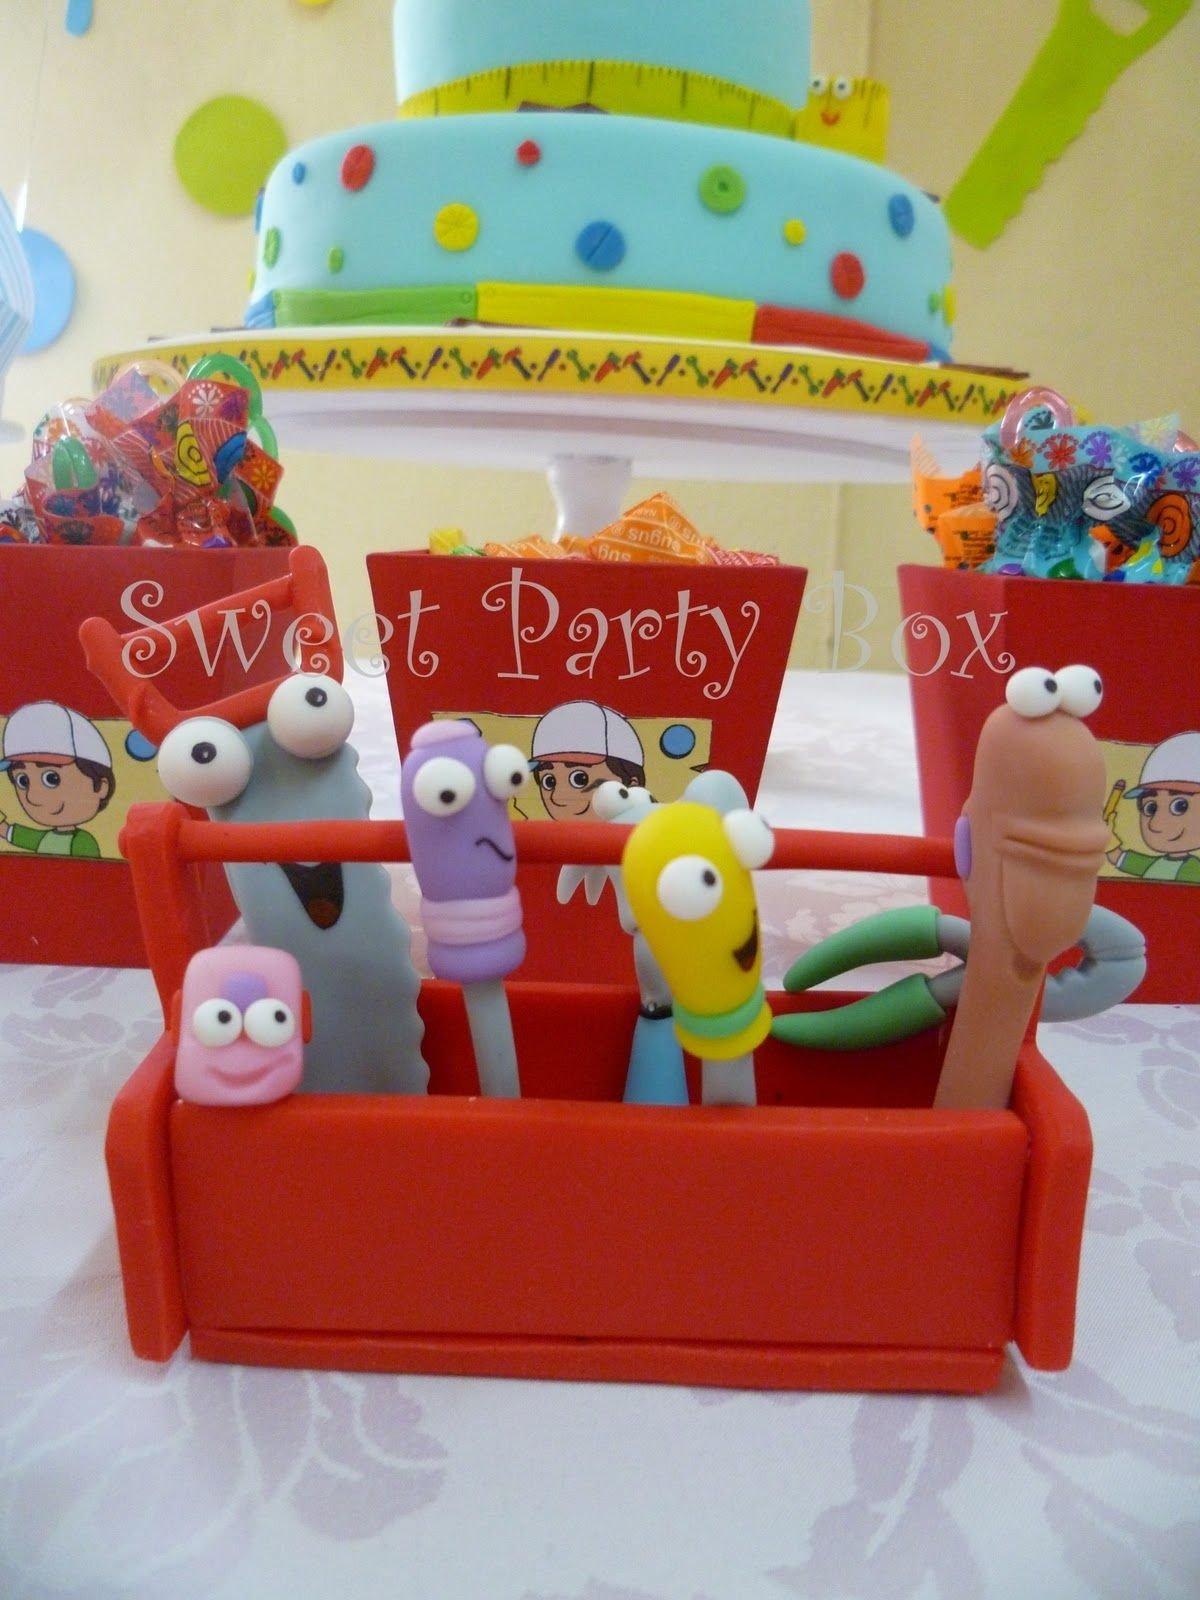 10 Amazing Handy Manny Birthday Party Ideas handy manny birthday ideas home design ideas 2020